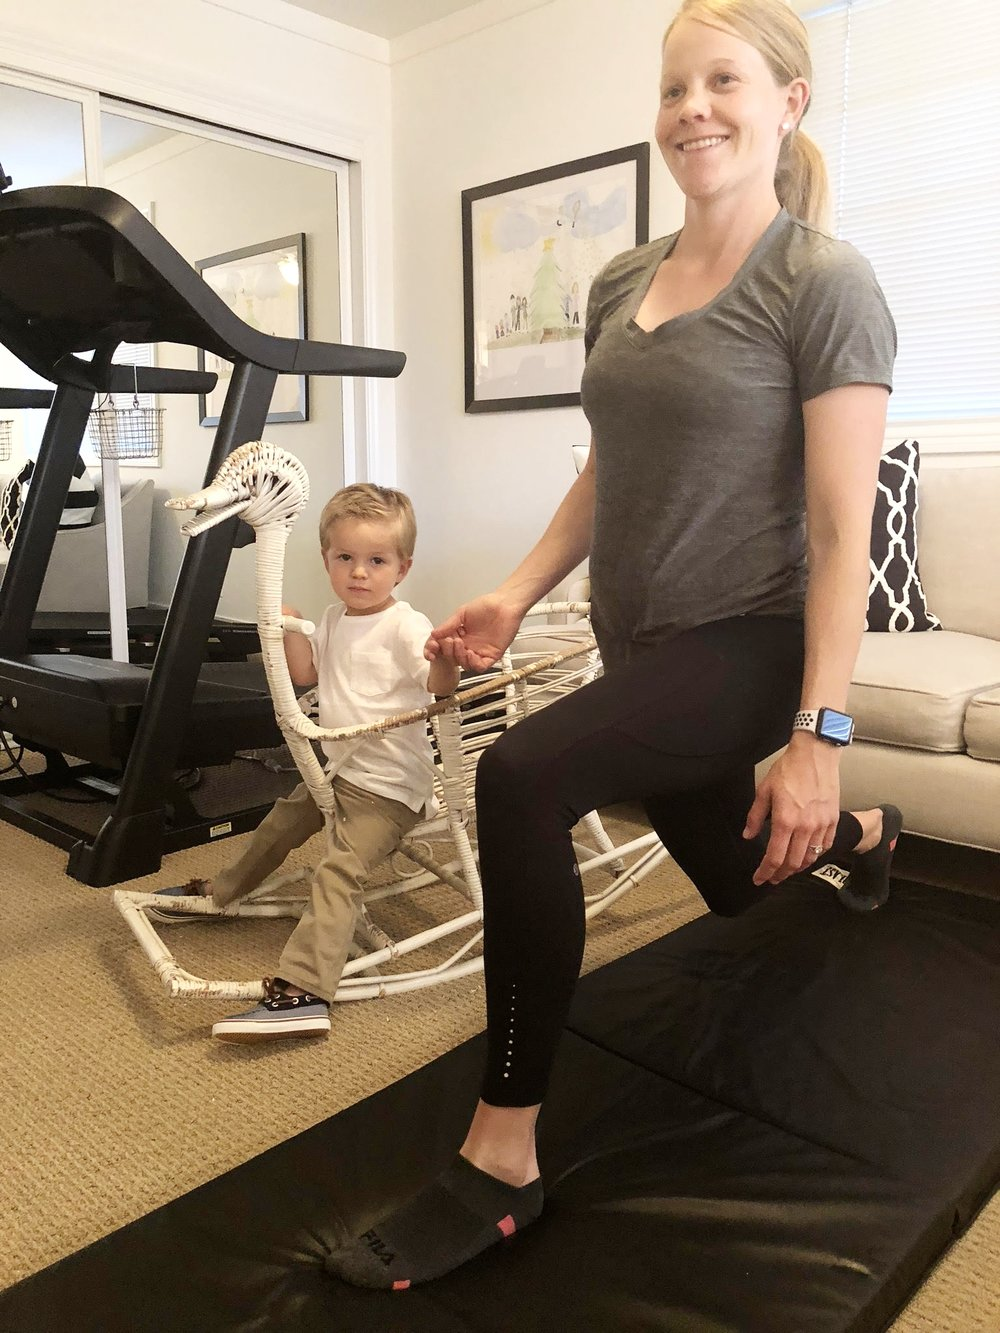 Facebook Mom's workout